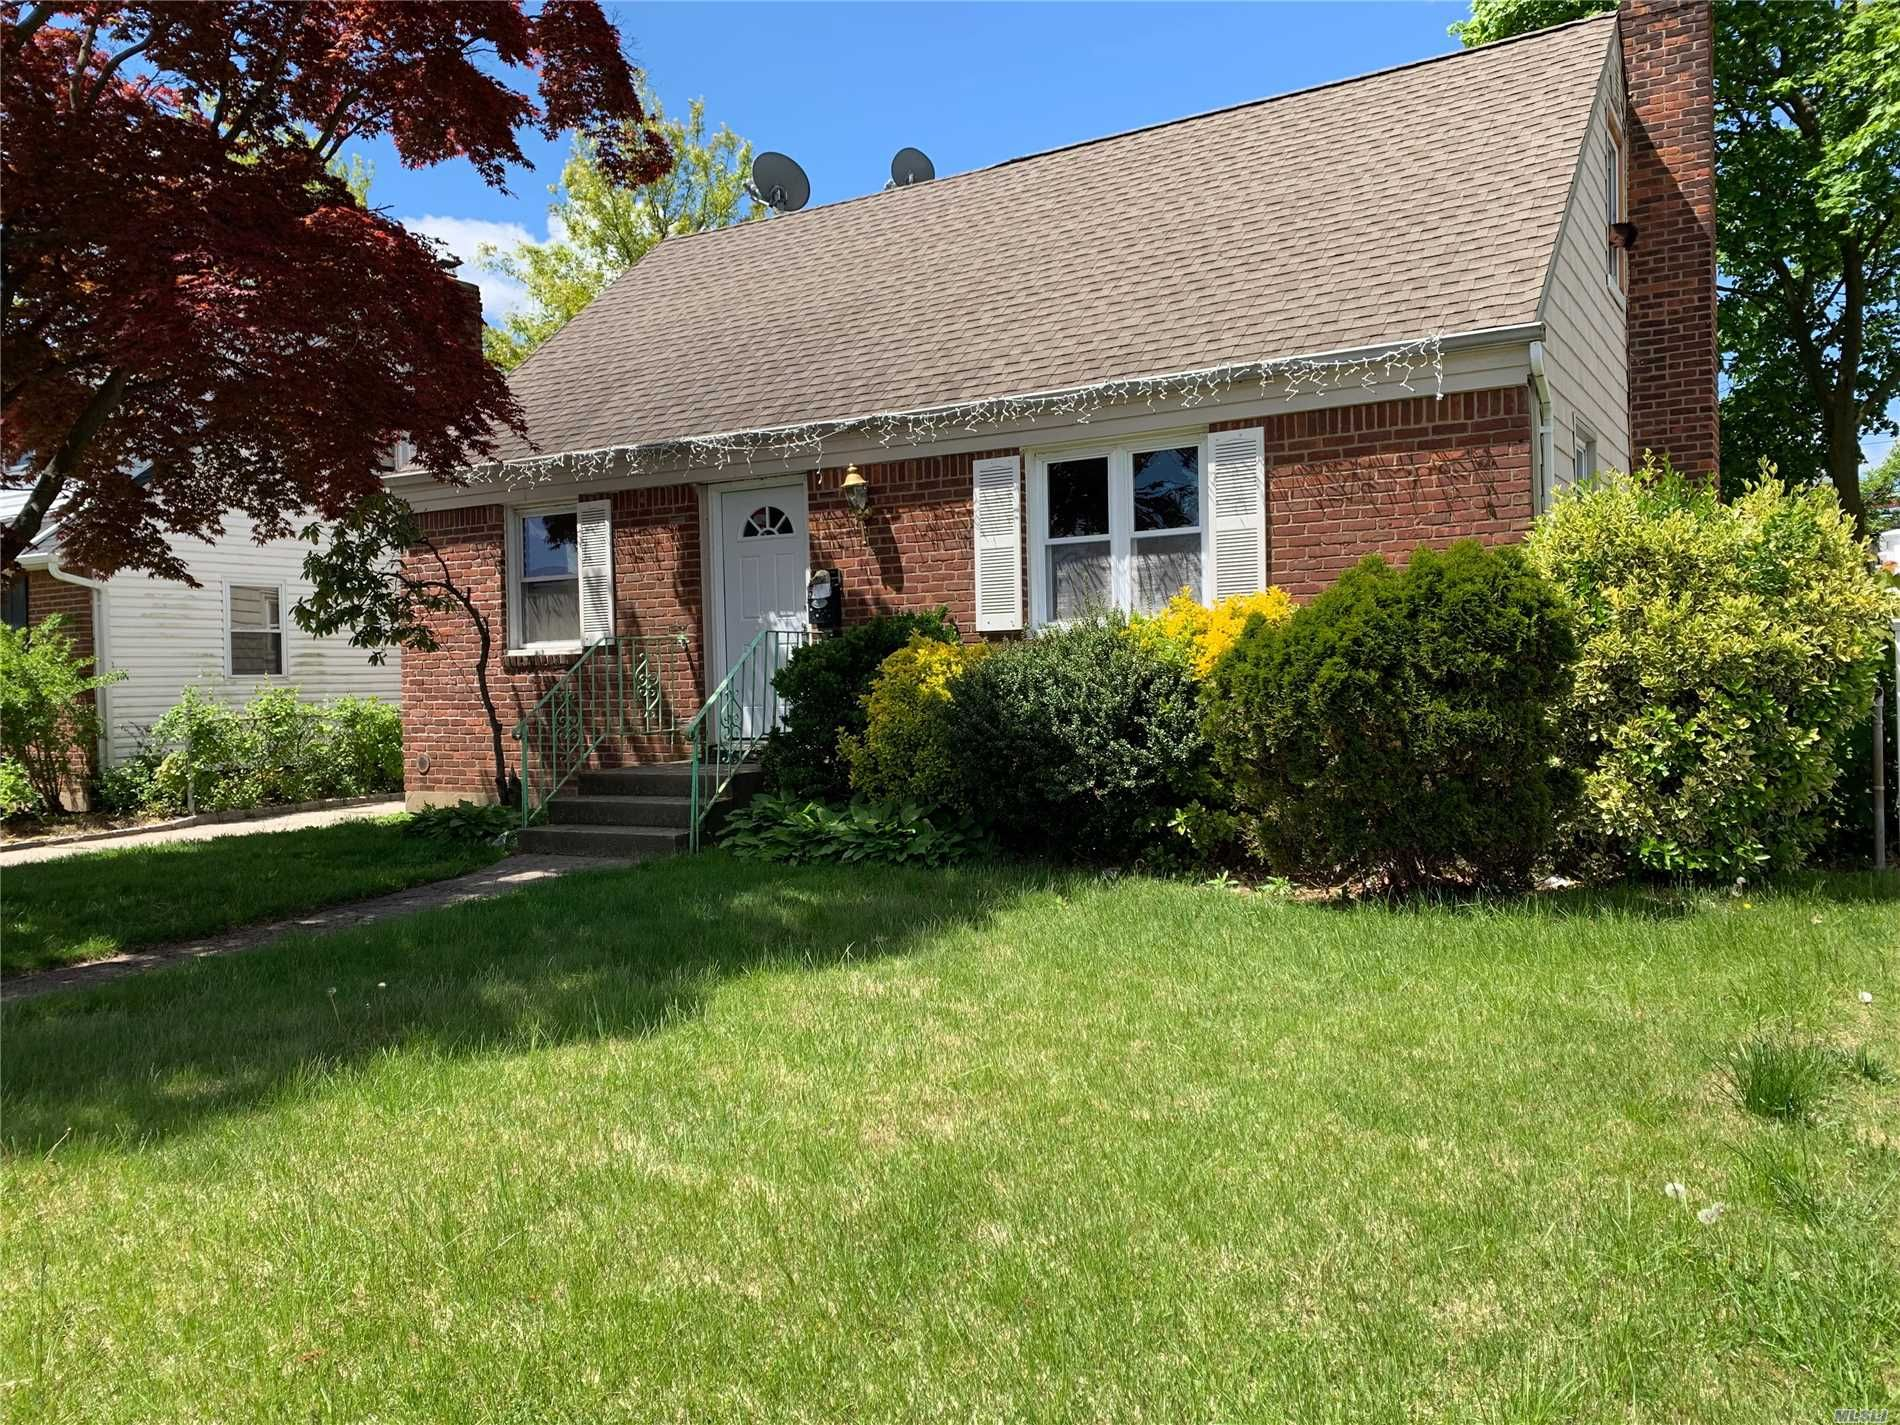 572 Clark Pl, Uniondale, NY 11553 - 4 Bed, 2 Bath Single-Family Home - MLS  #3128943 - 4 Photos | Trulia